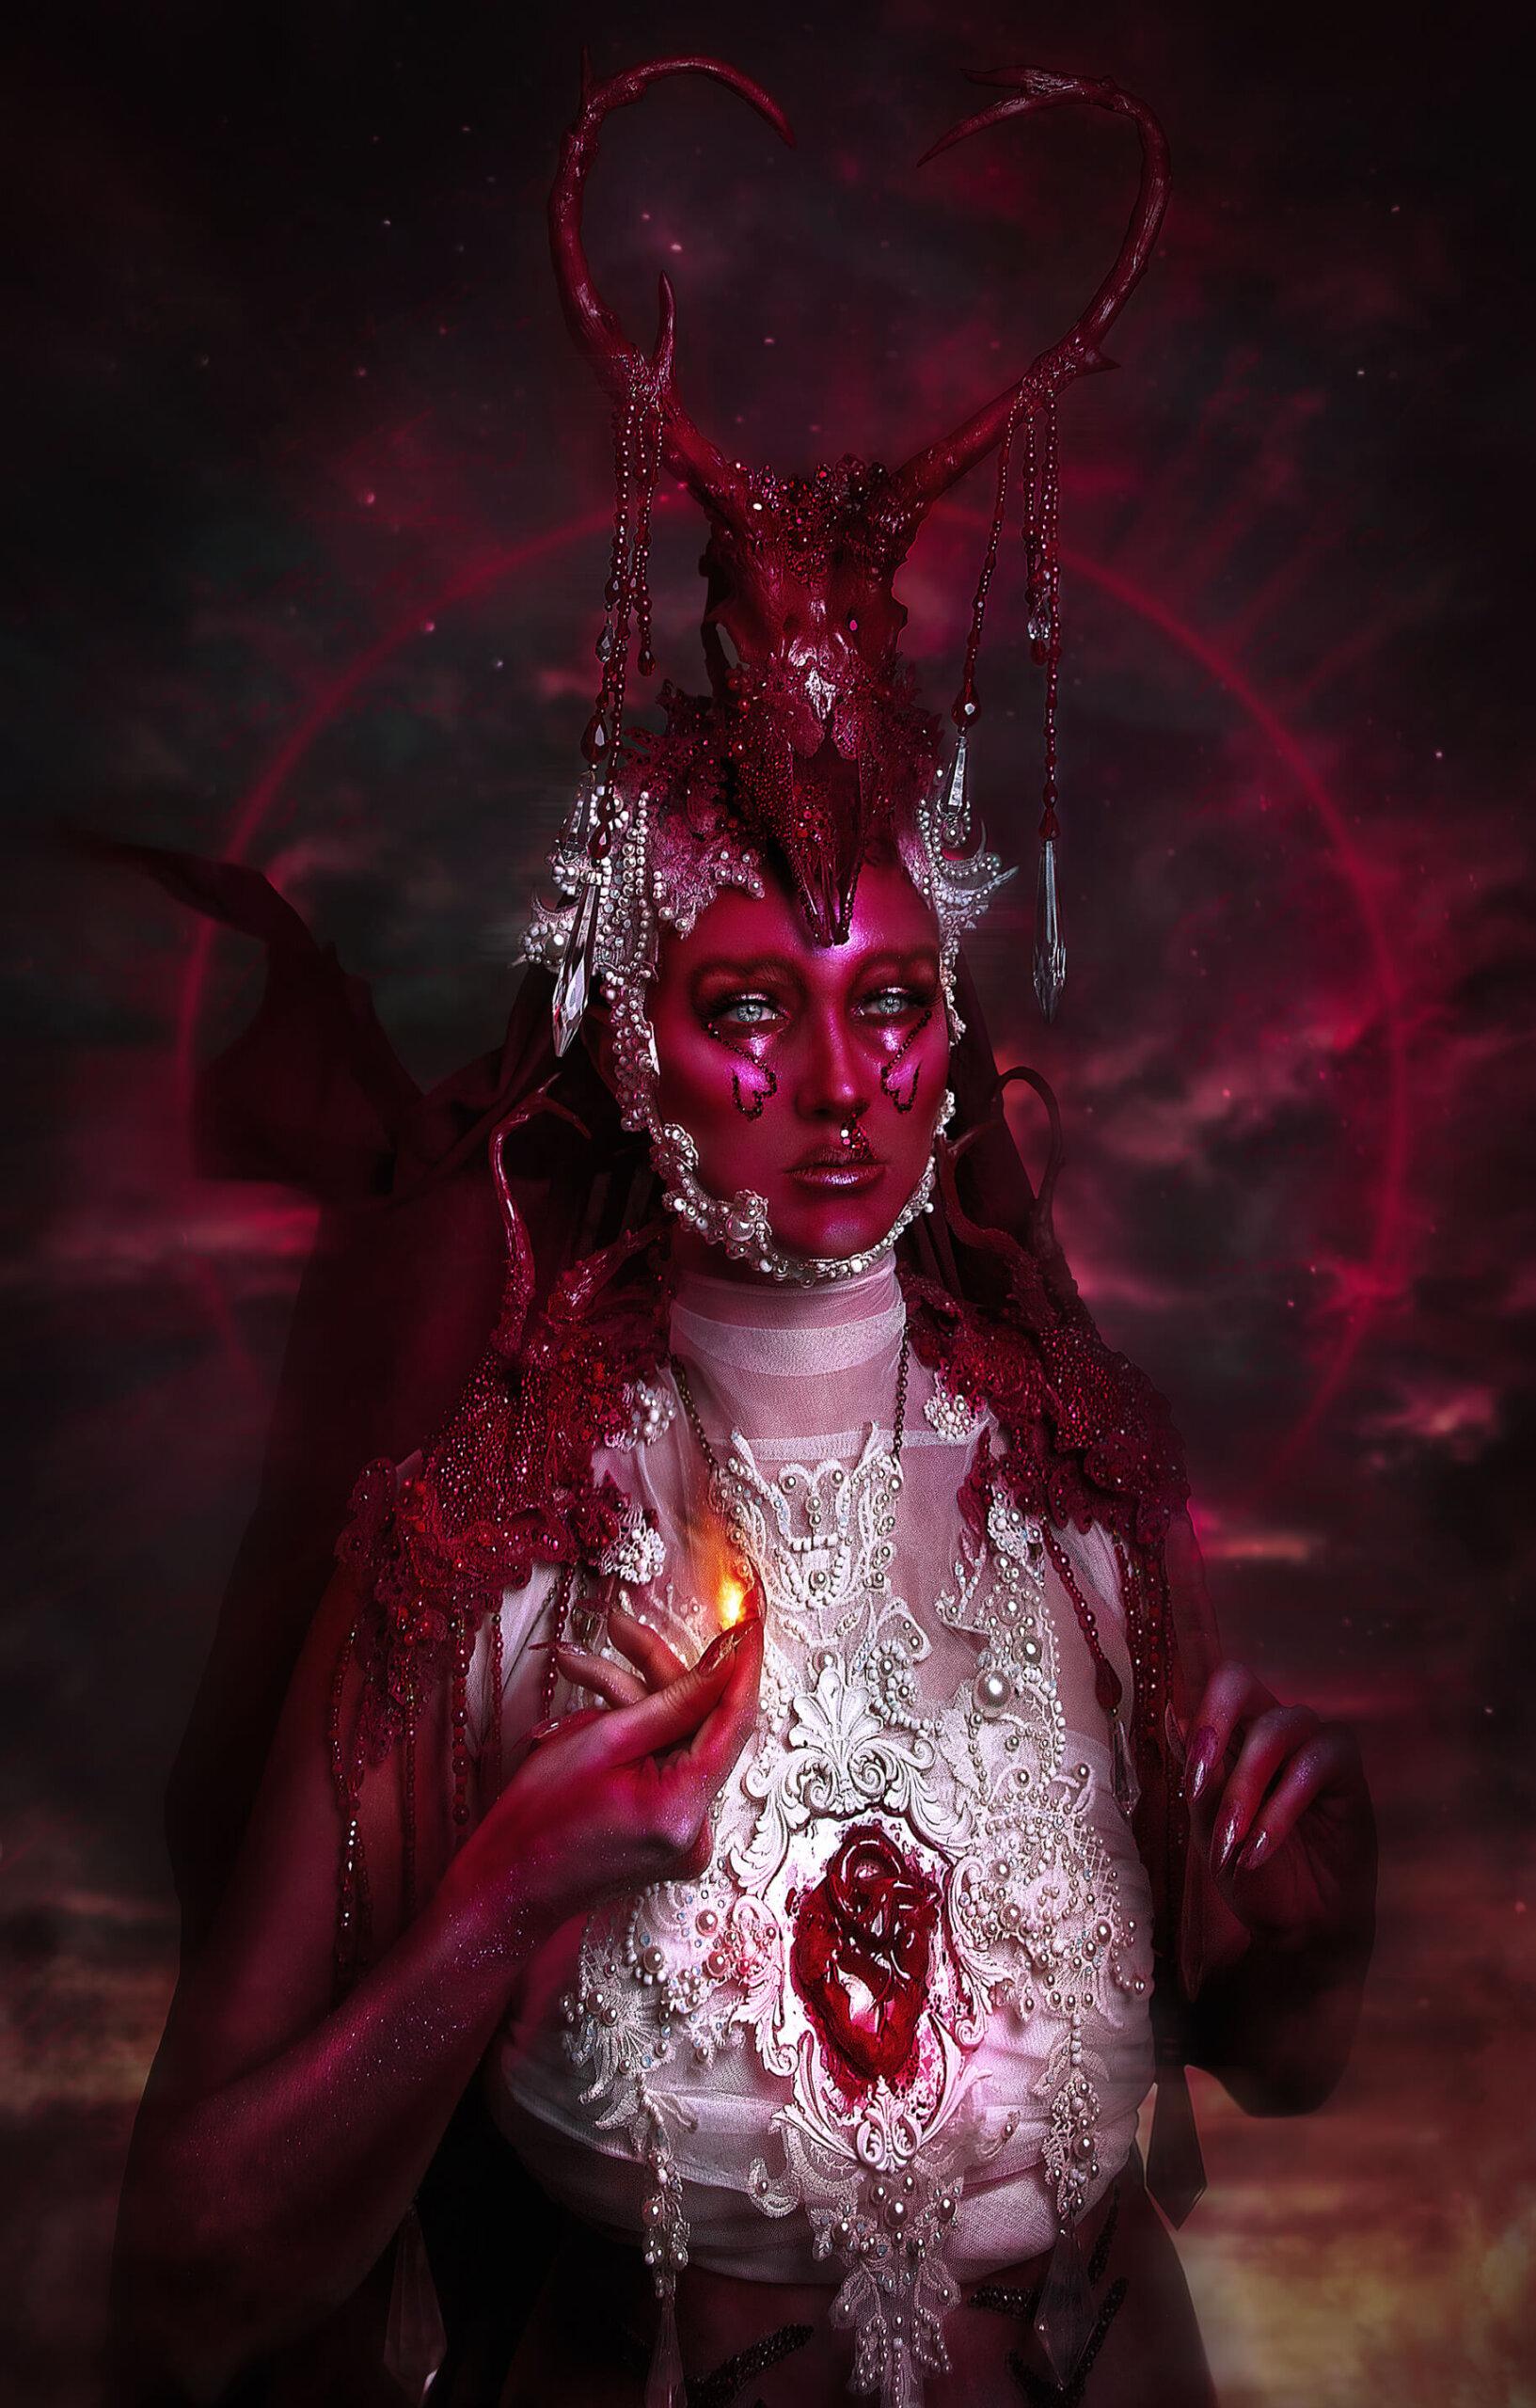 Valentine red make-up - candy makeup artist